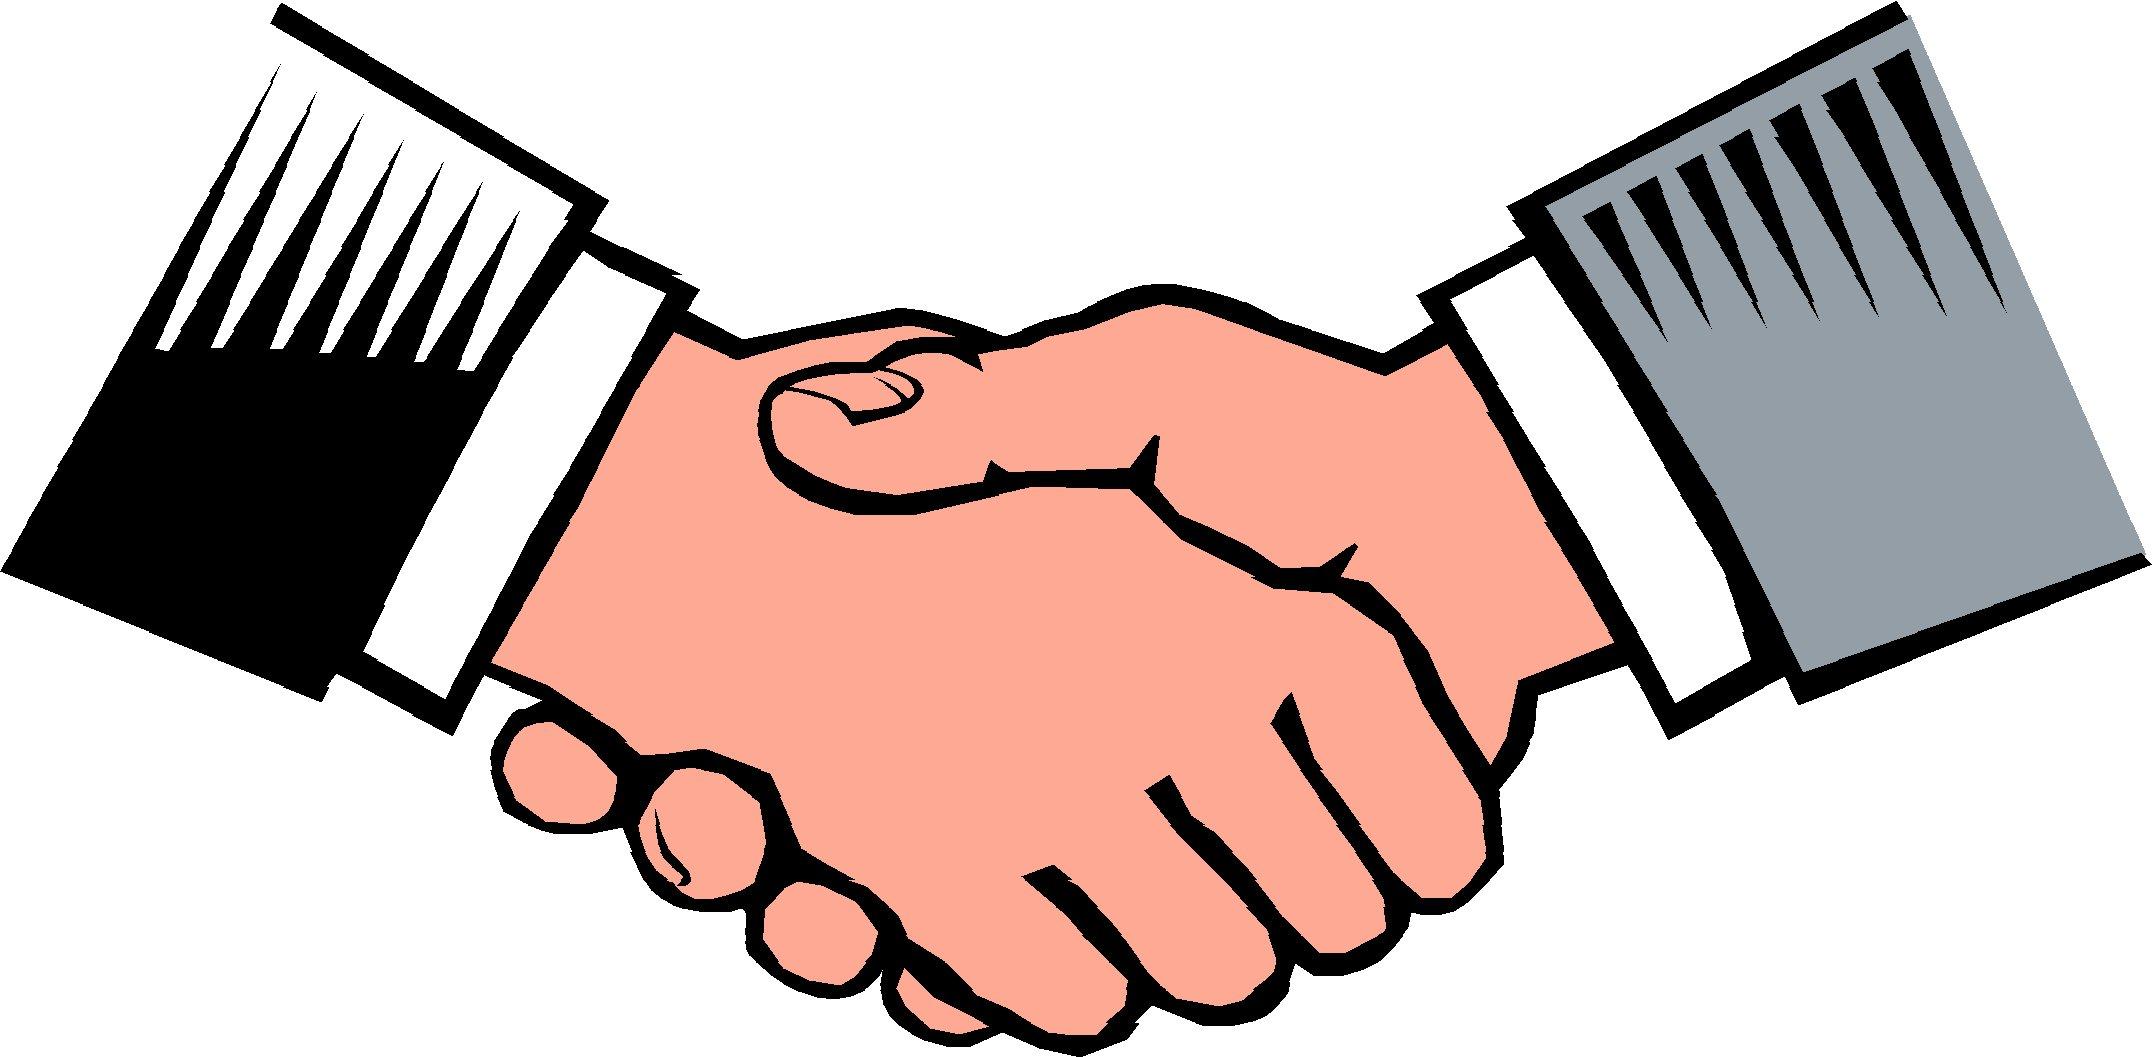 2152x1057 Professional Clipart Handshake